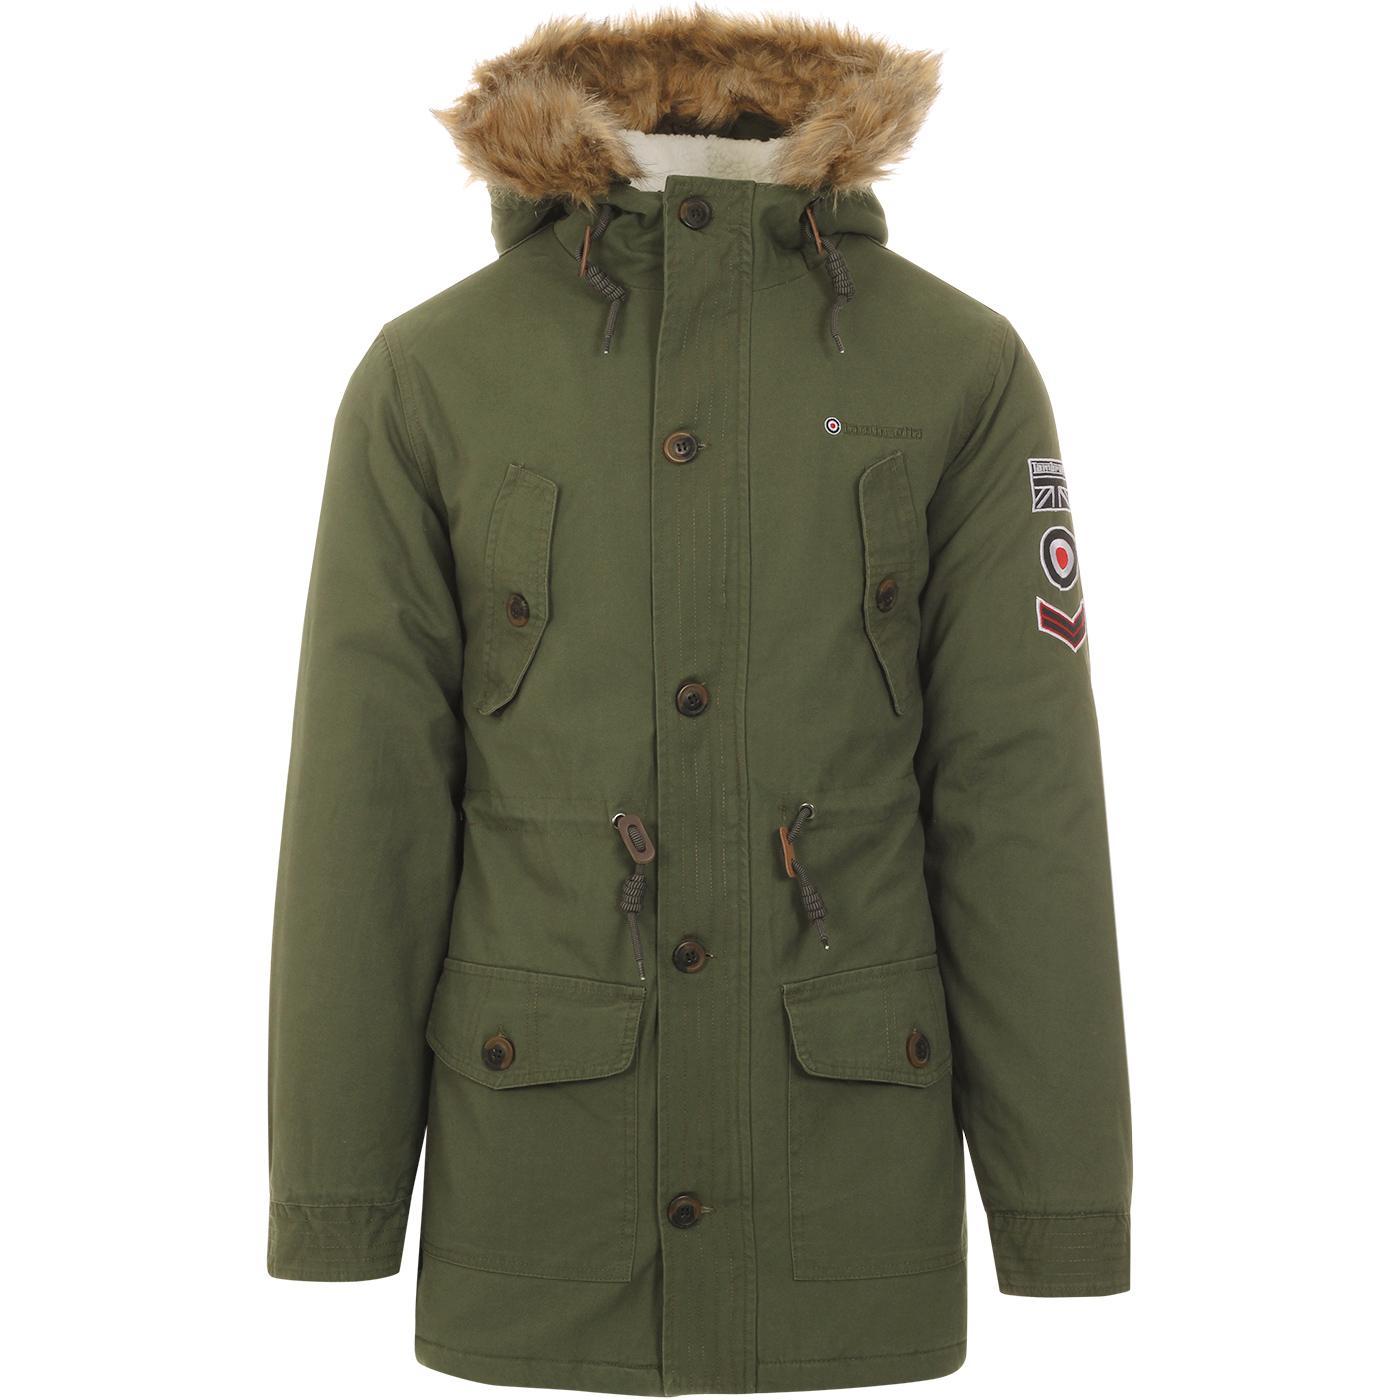 LAMBRETTA Mens Classic Mod Fishtail Parka Jacket